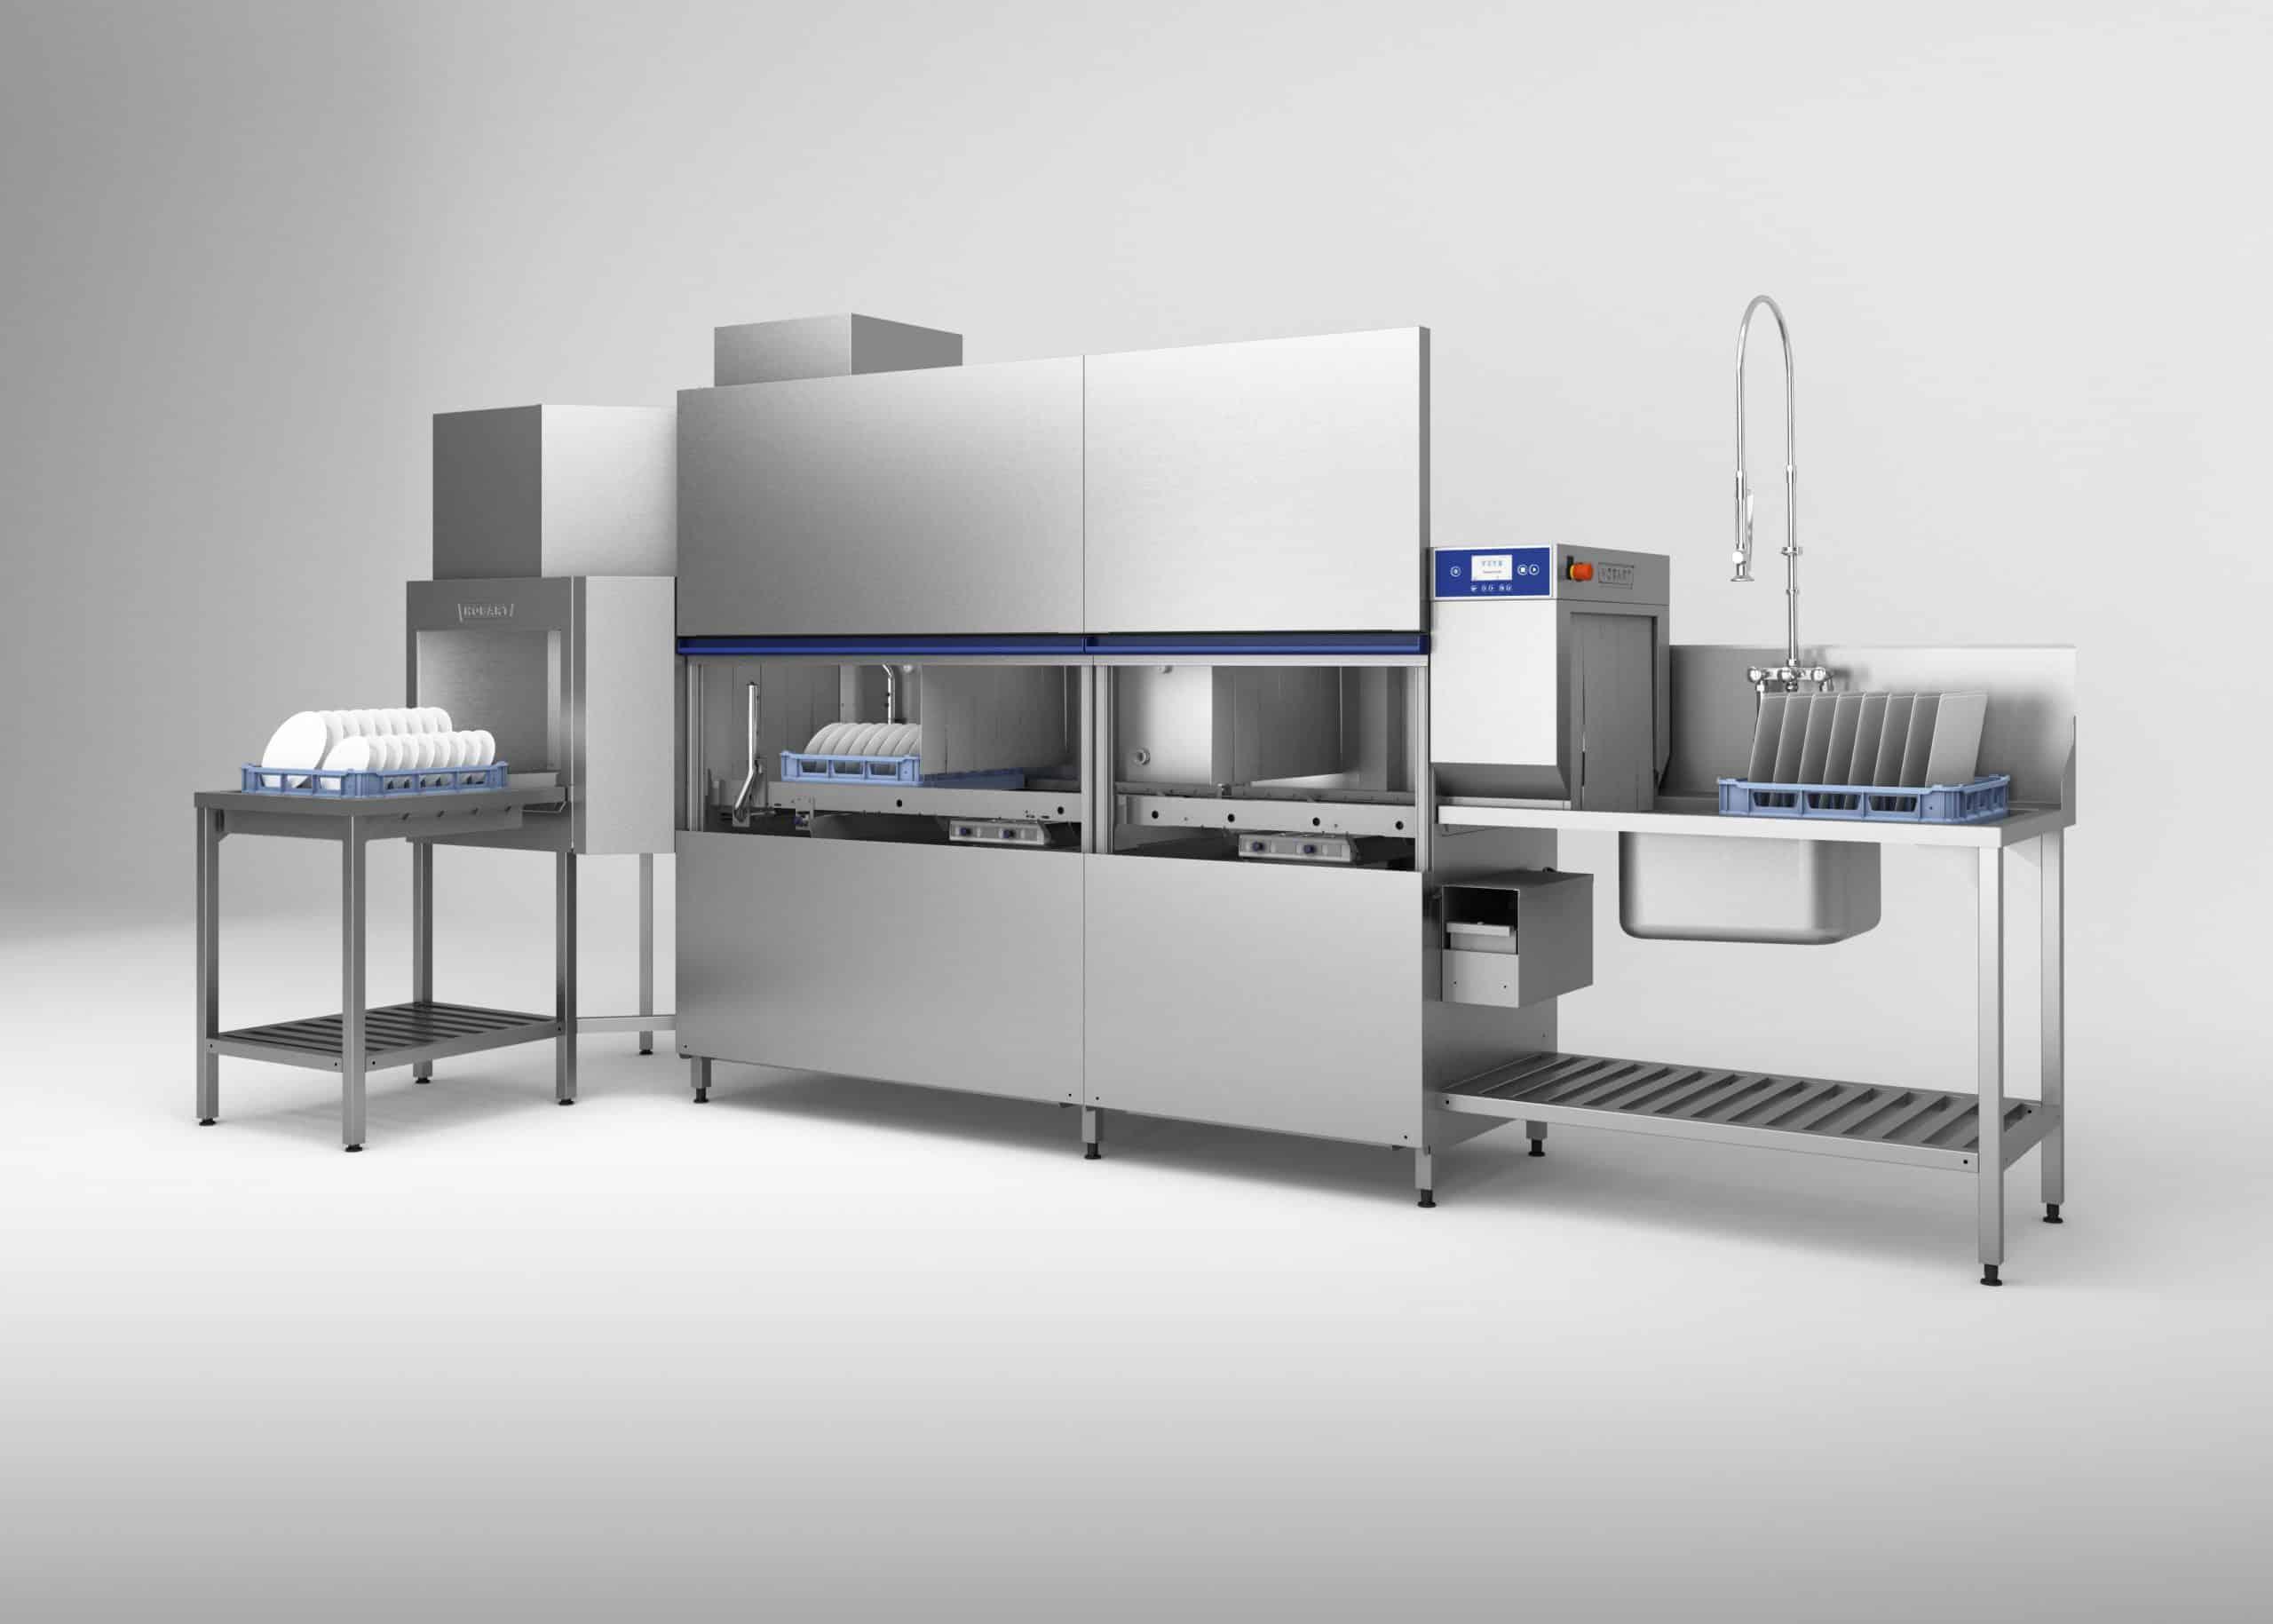 Hobart Neue Korbtransport Spulmaschine Foodservice Equipment News